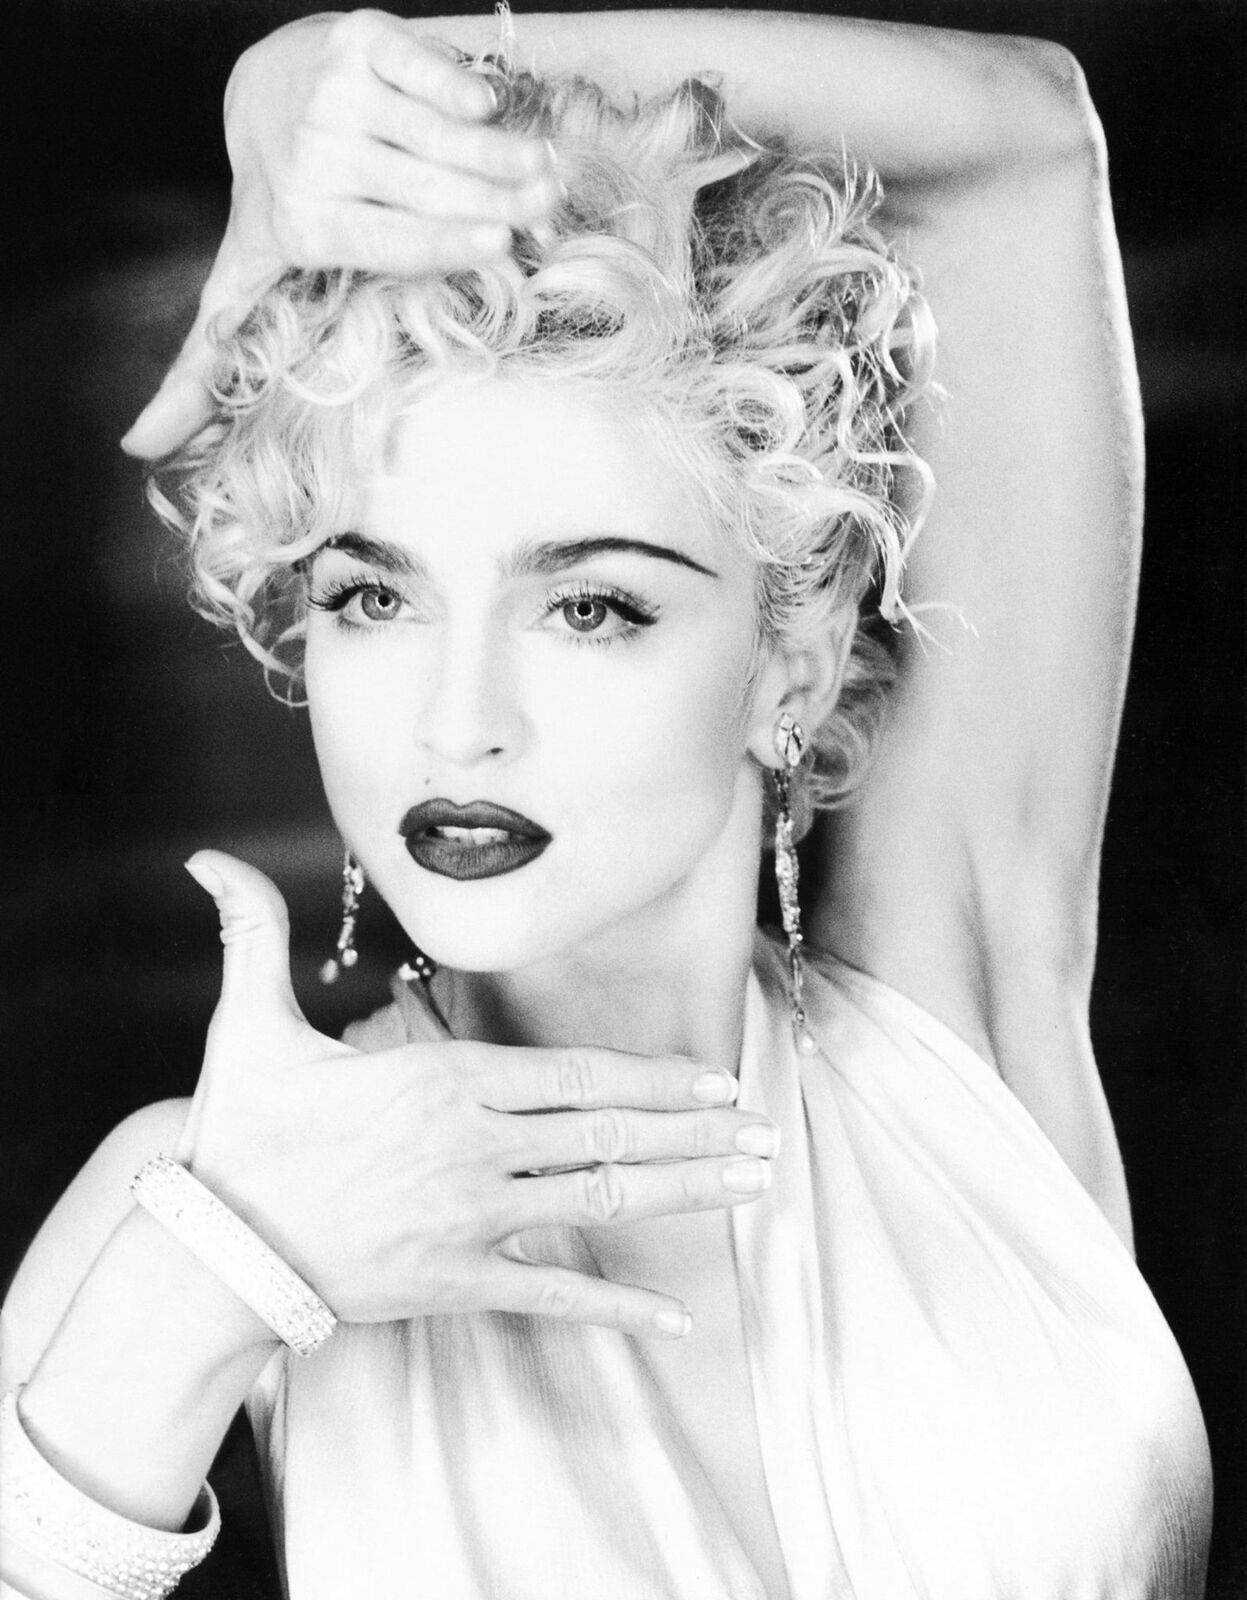 Madonna Black And White : madonna, black, white, Madonna, Black, White, Vogue, Vogue,, Madonna,, Poses